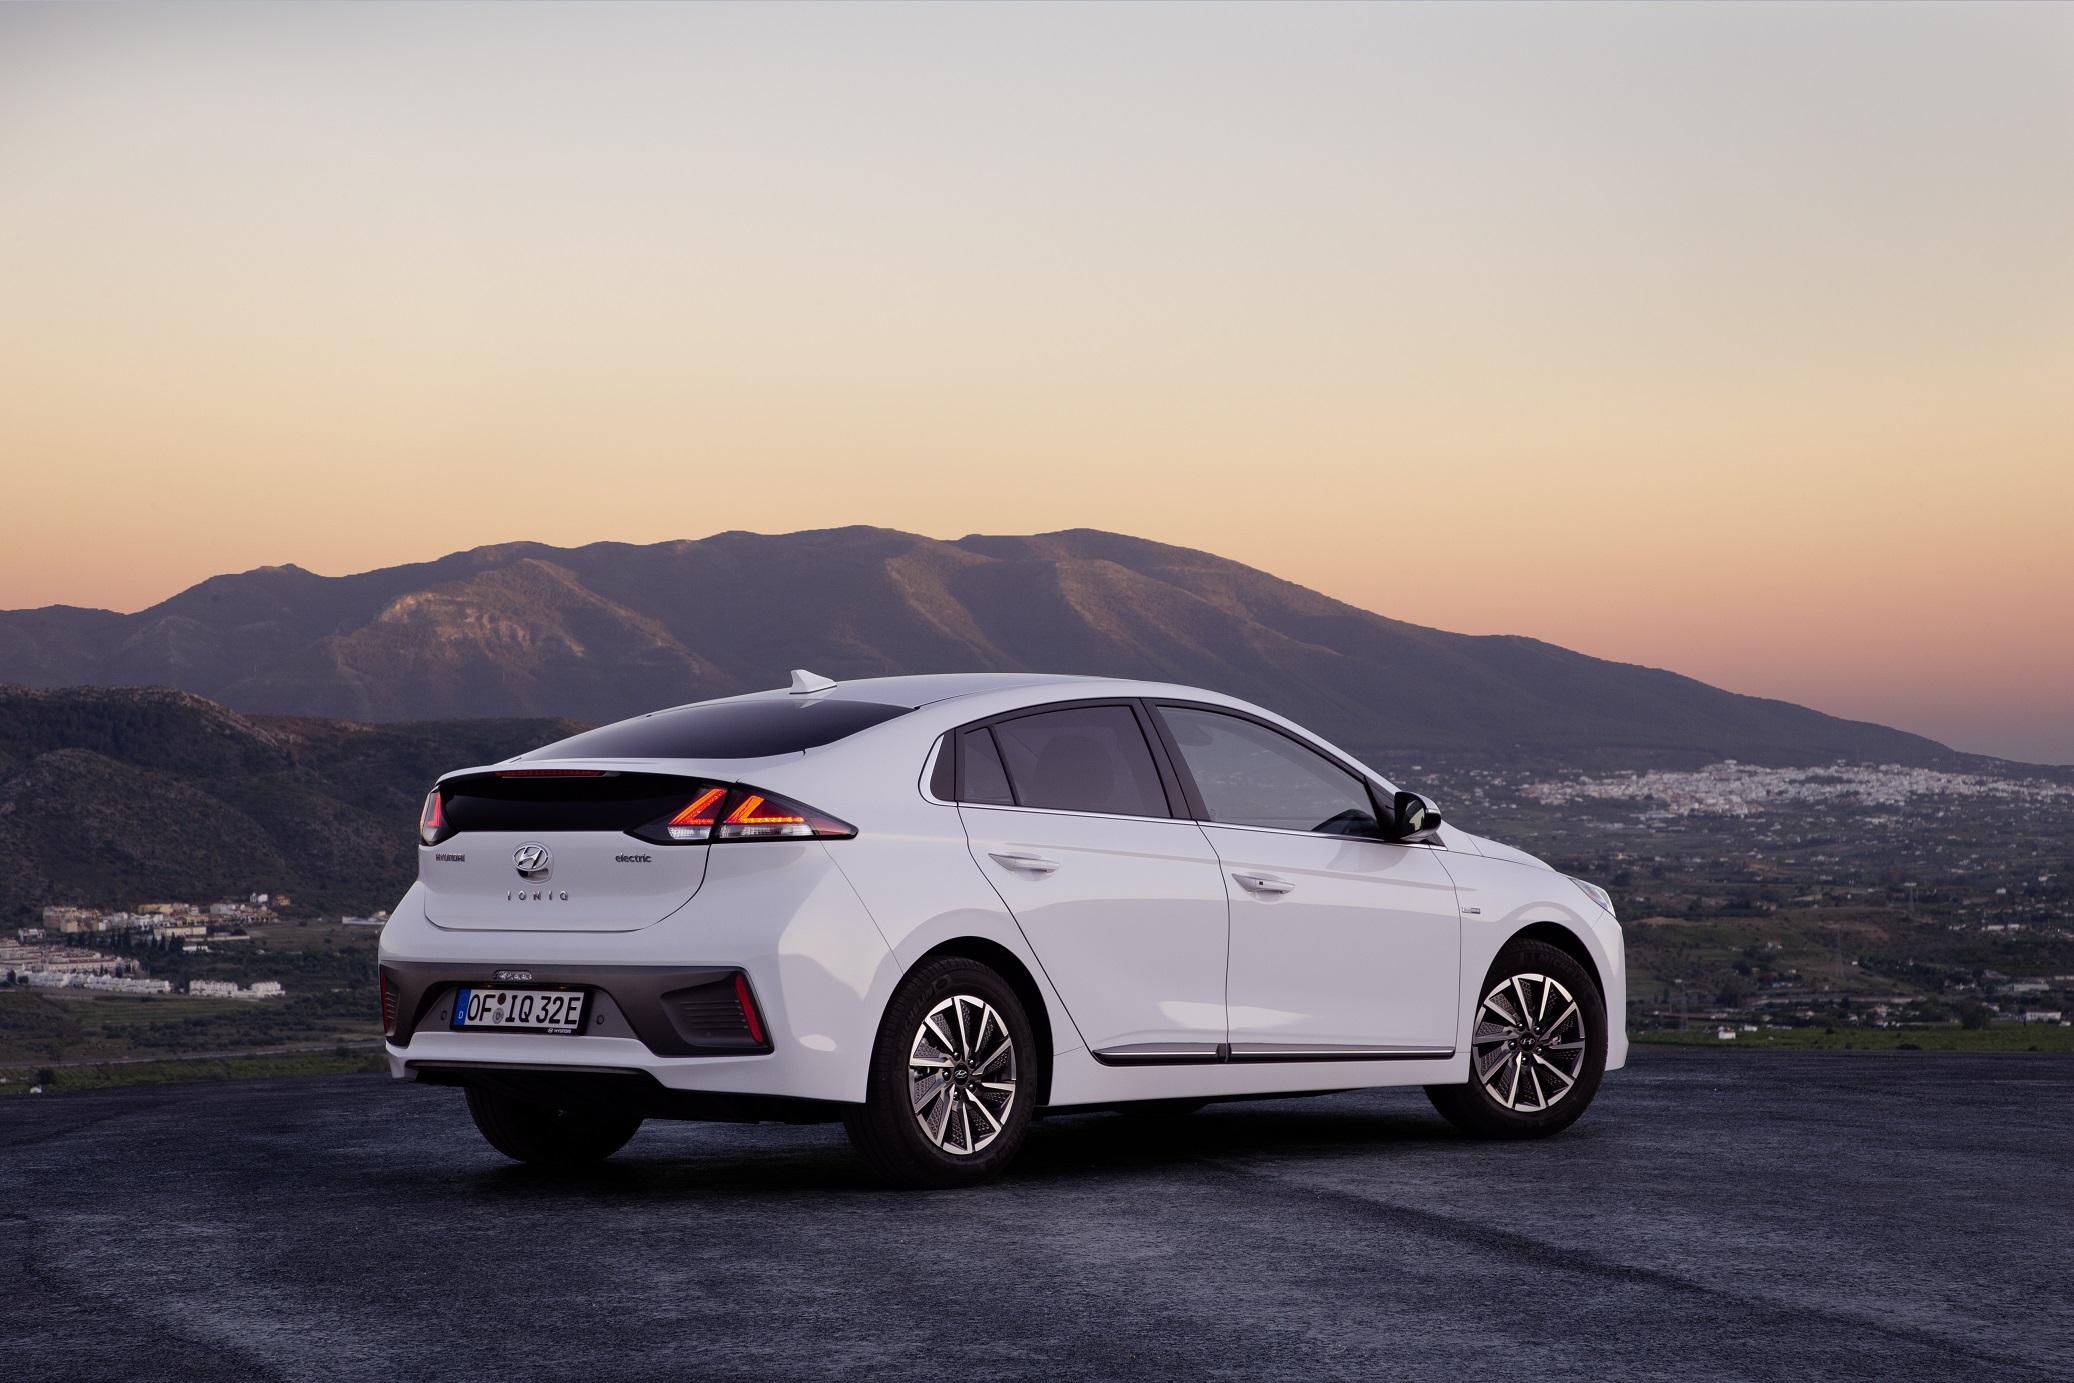 2020 Hyundai Ioniq Electric Gets Larger Battery 182 Mile Range Evbite